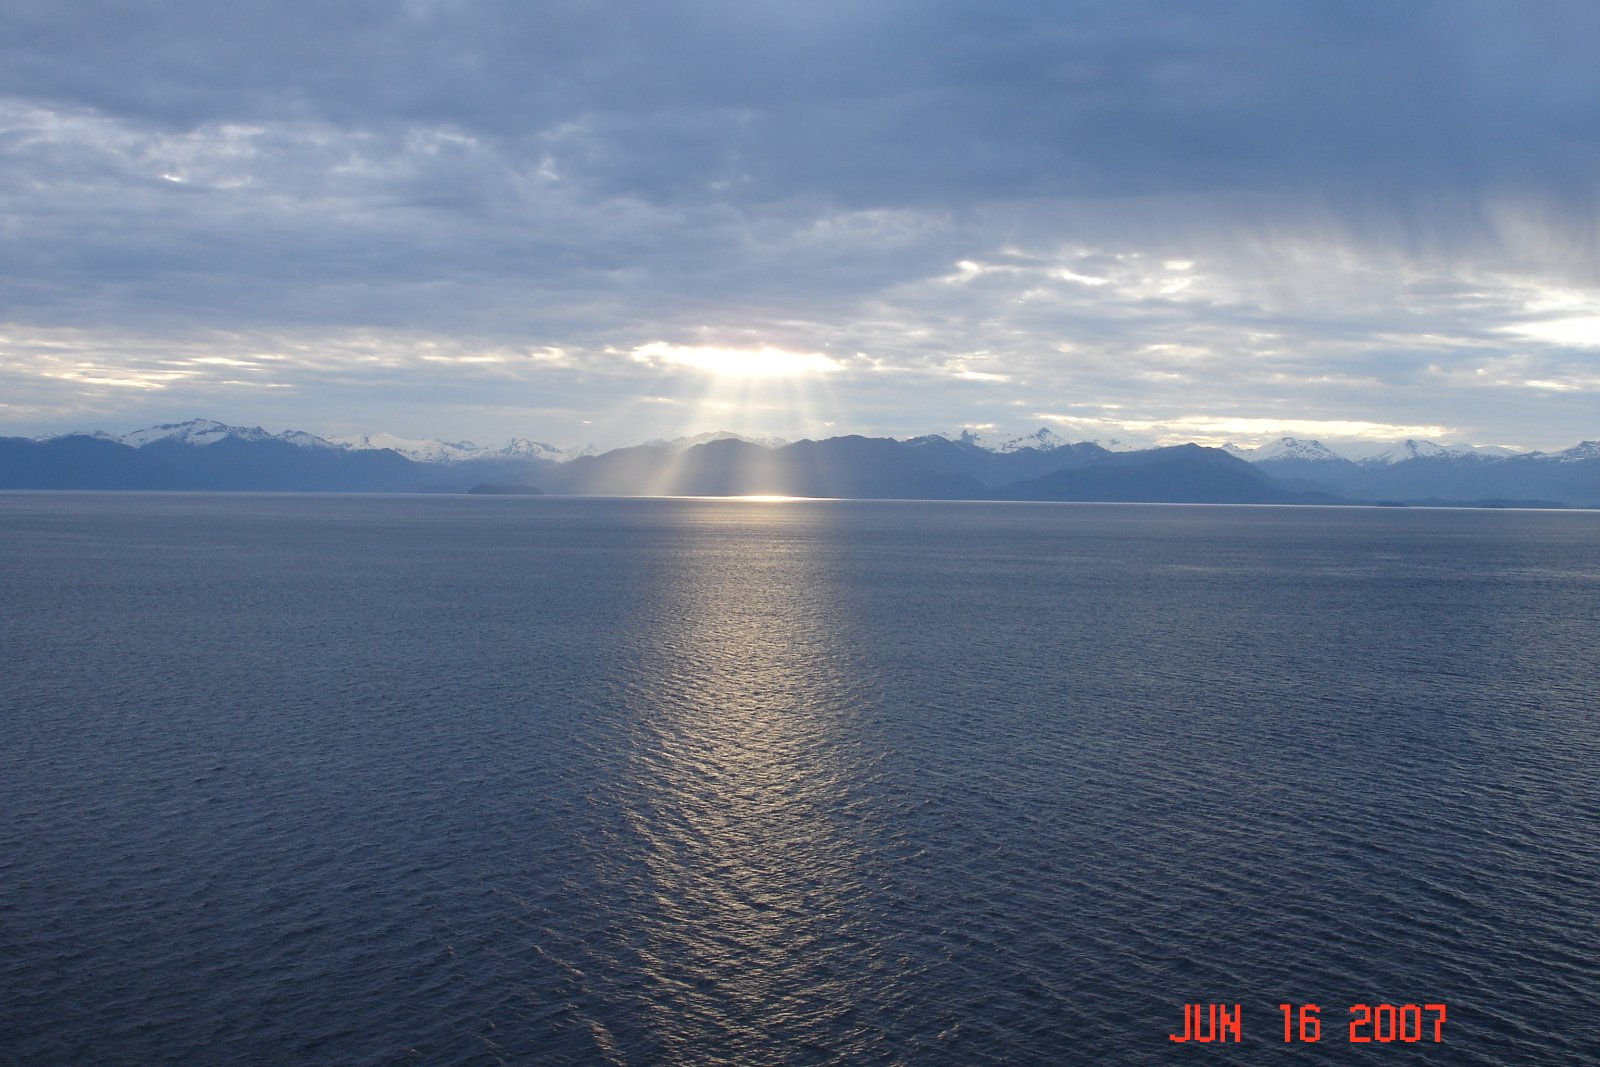 Click image for larger version  Name:Alaska 2007 001.jpg Views:71 Size:261.0 KB ID:116610